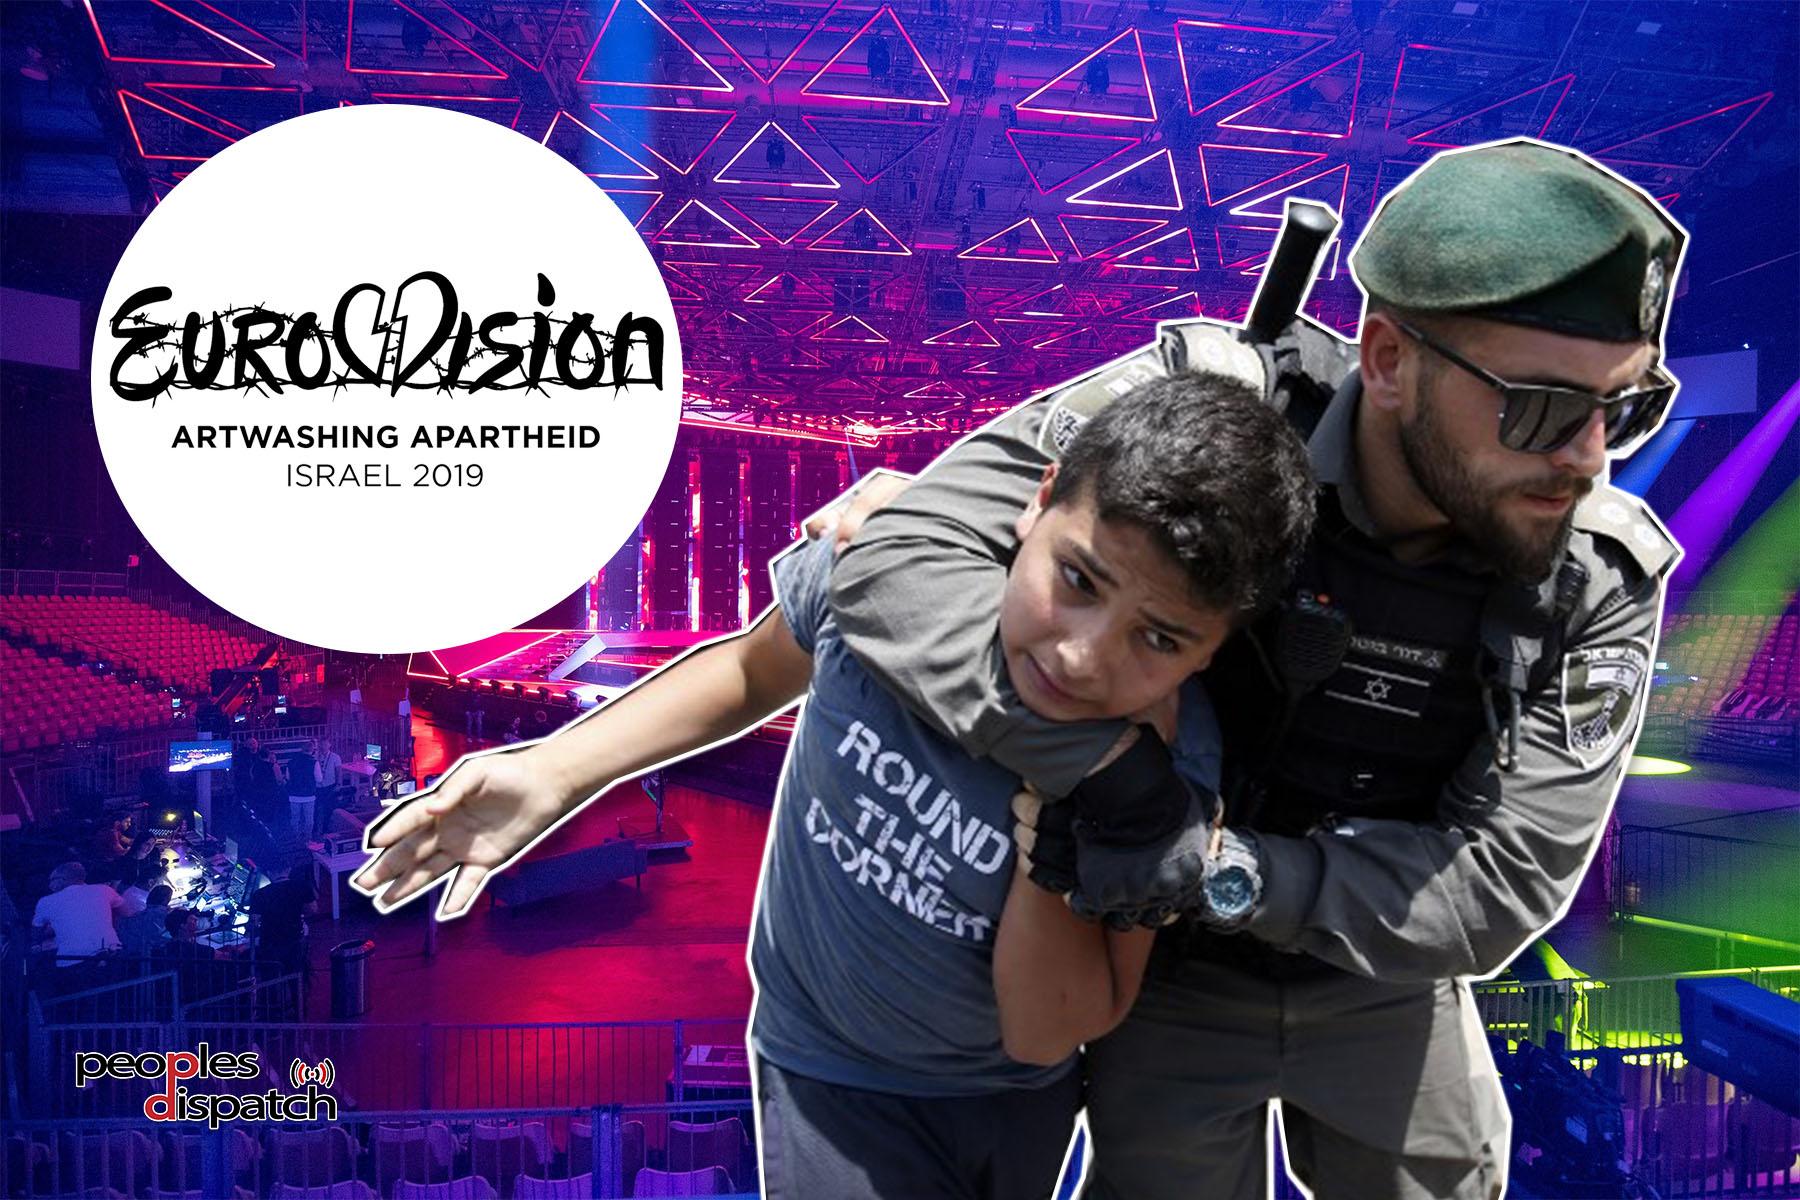 EUROVISION BOYCOTT 2019_ISRAEL